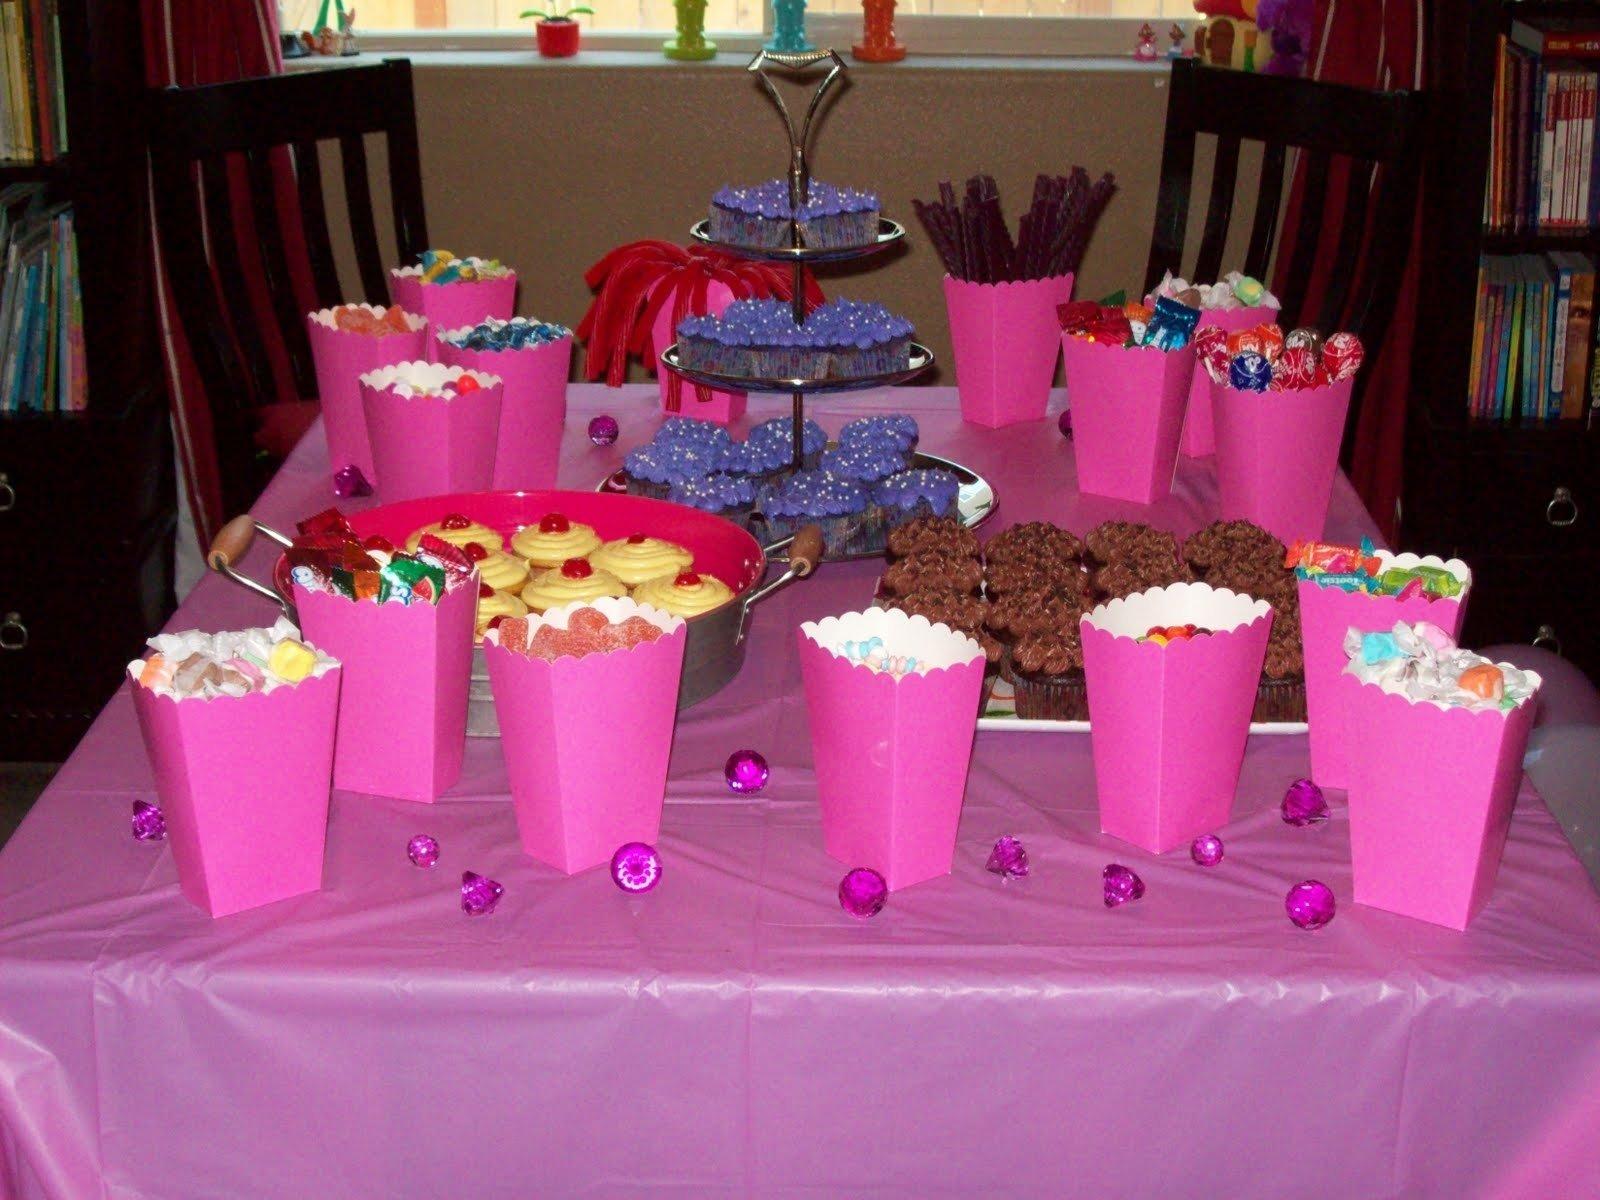 10 Fantastic Sweet 16 Ideas For Girls aprils homemaking sweet sixteen party 7 2020